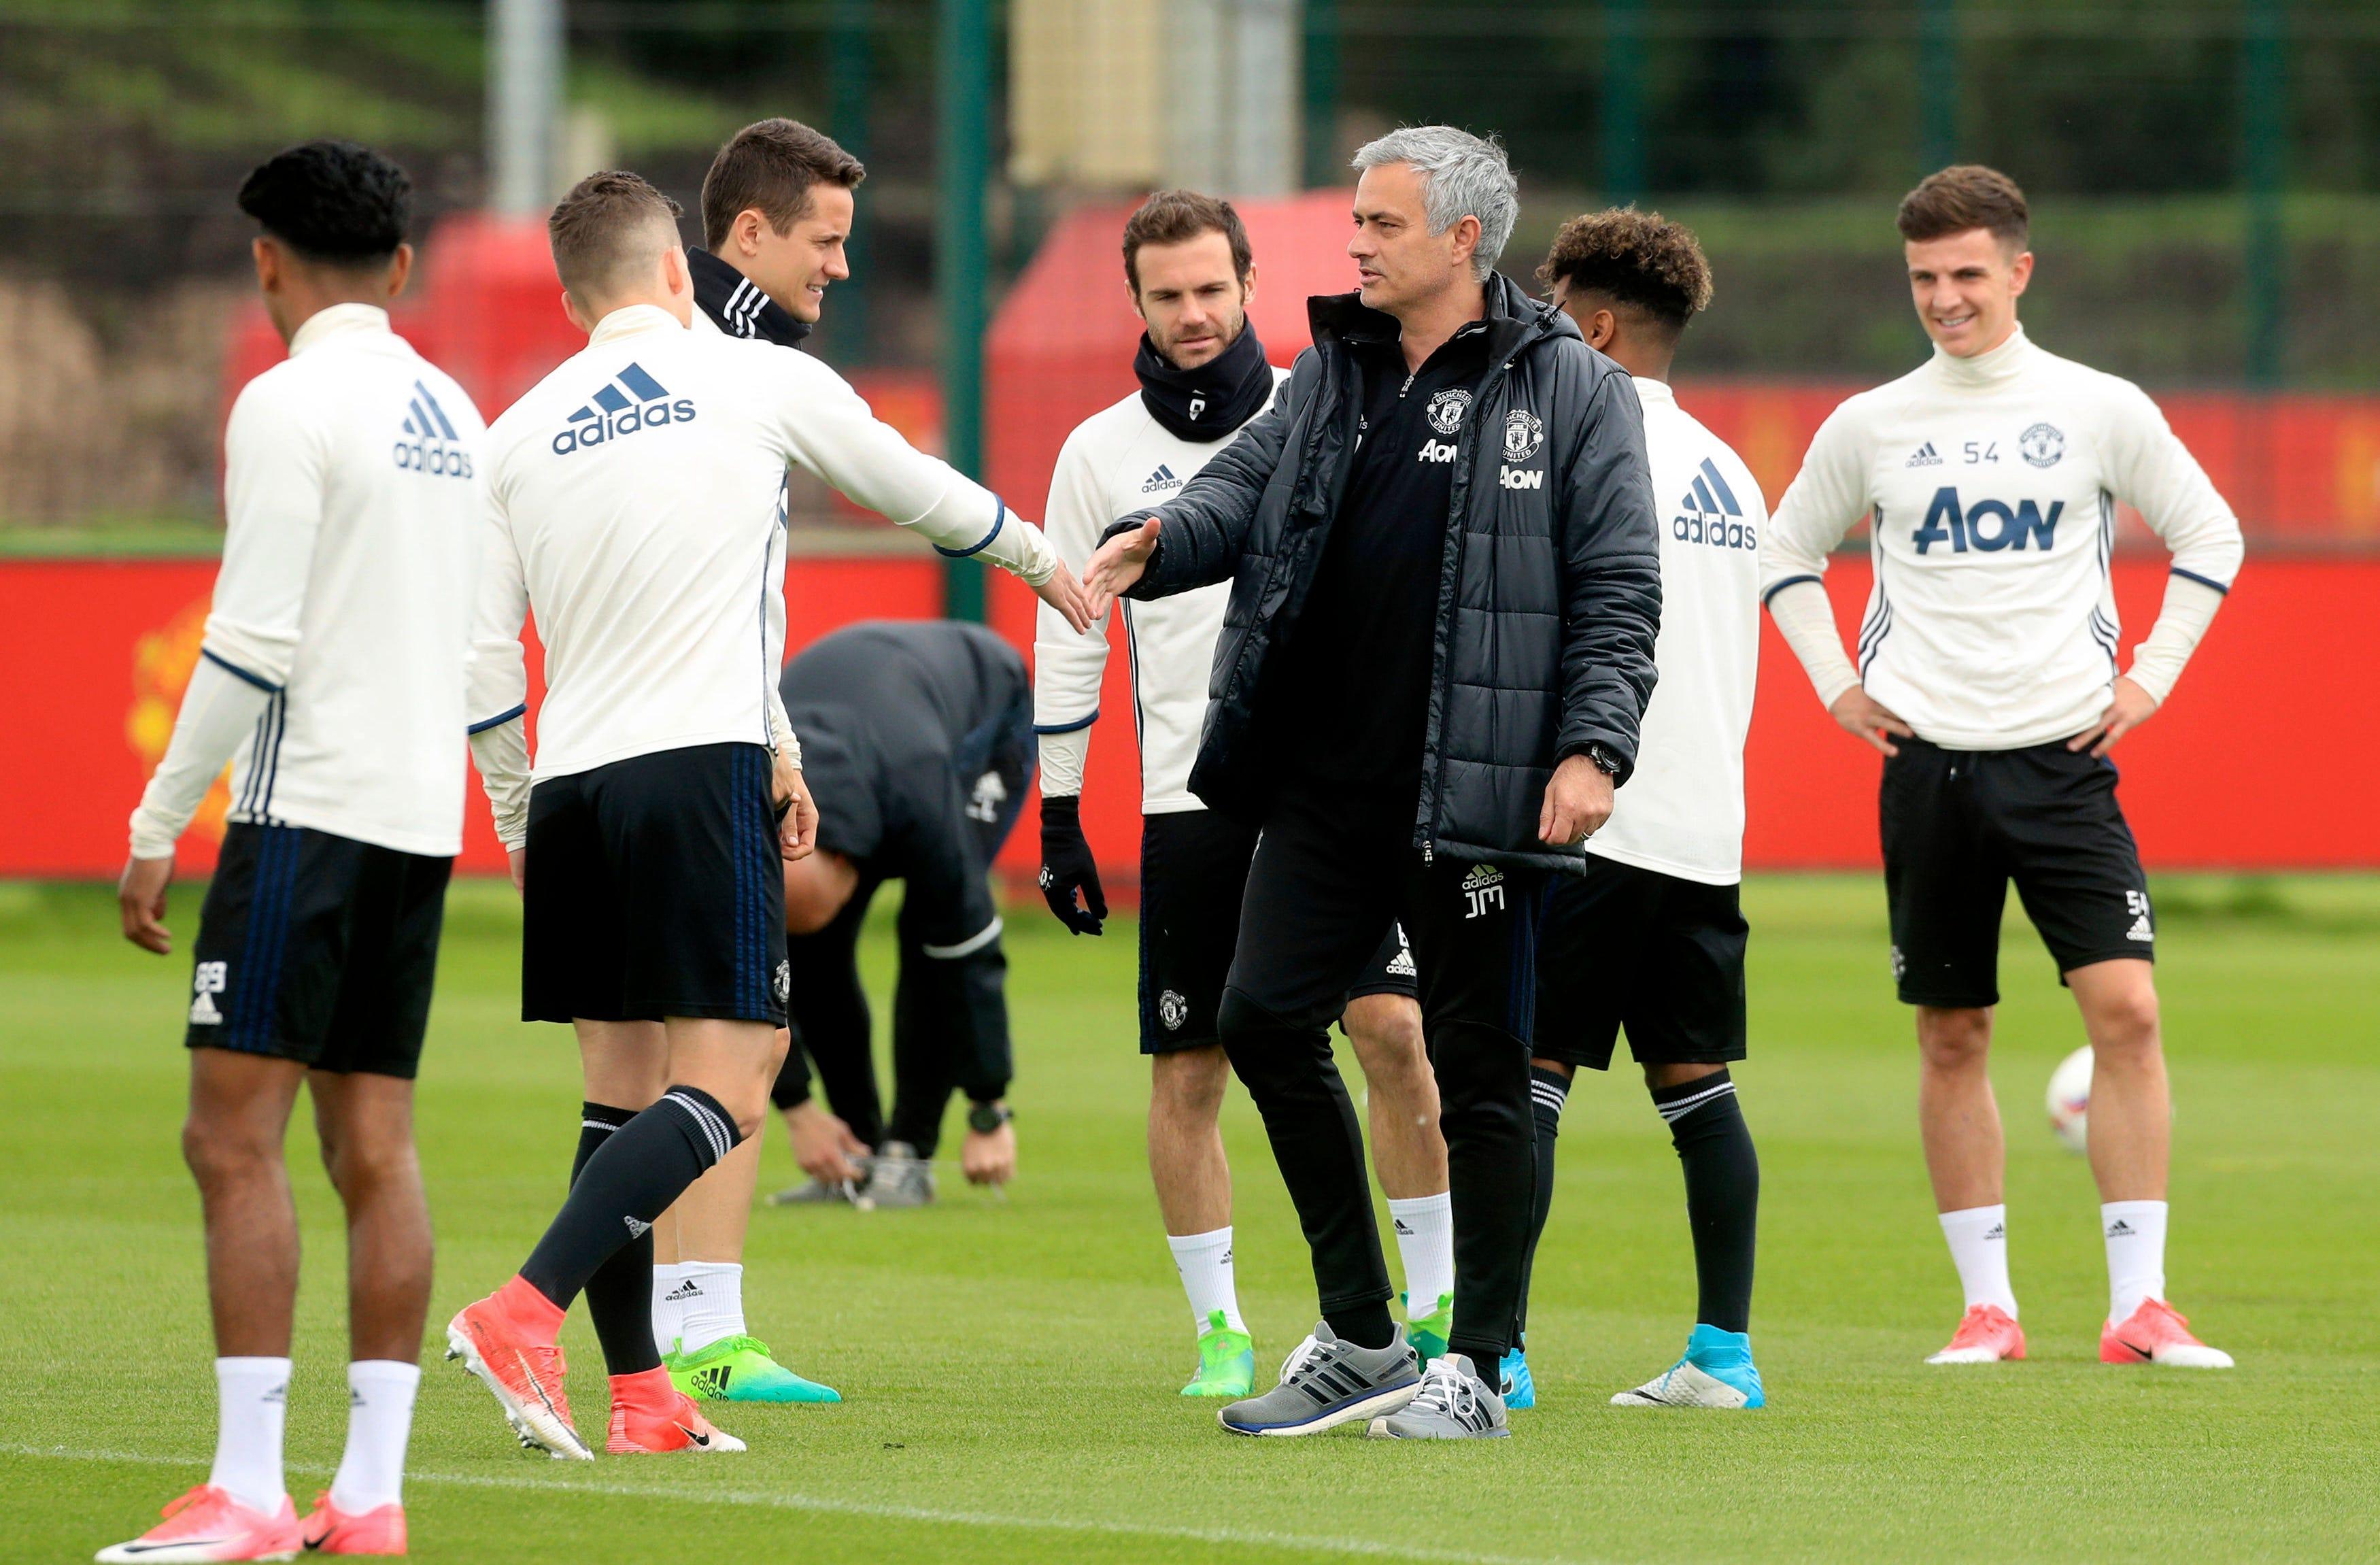 Man United's season hinges on winning Europa League final